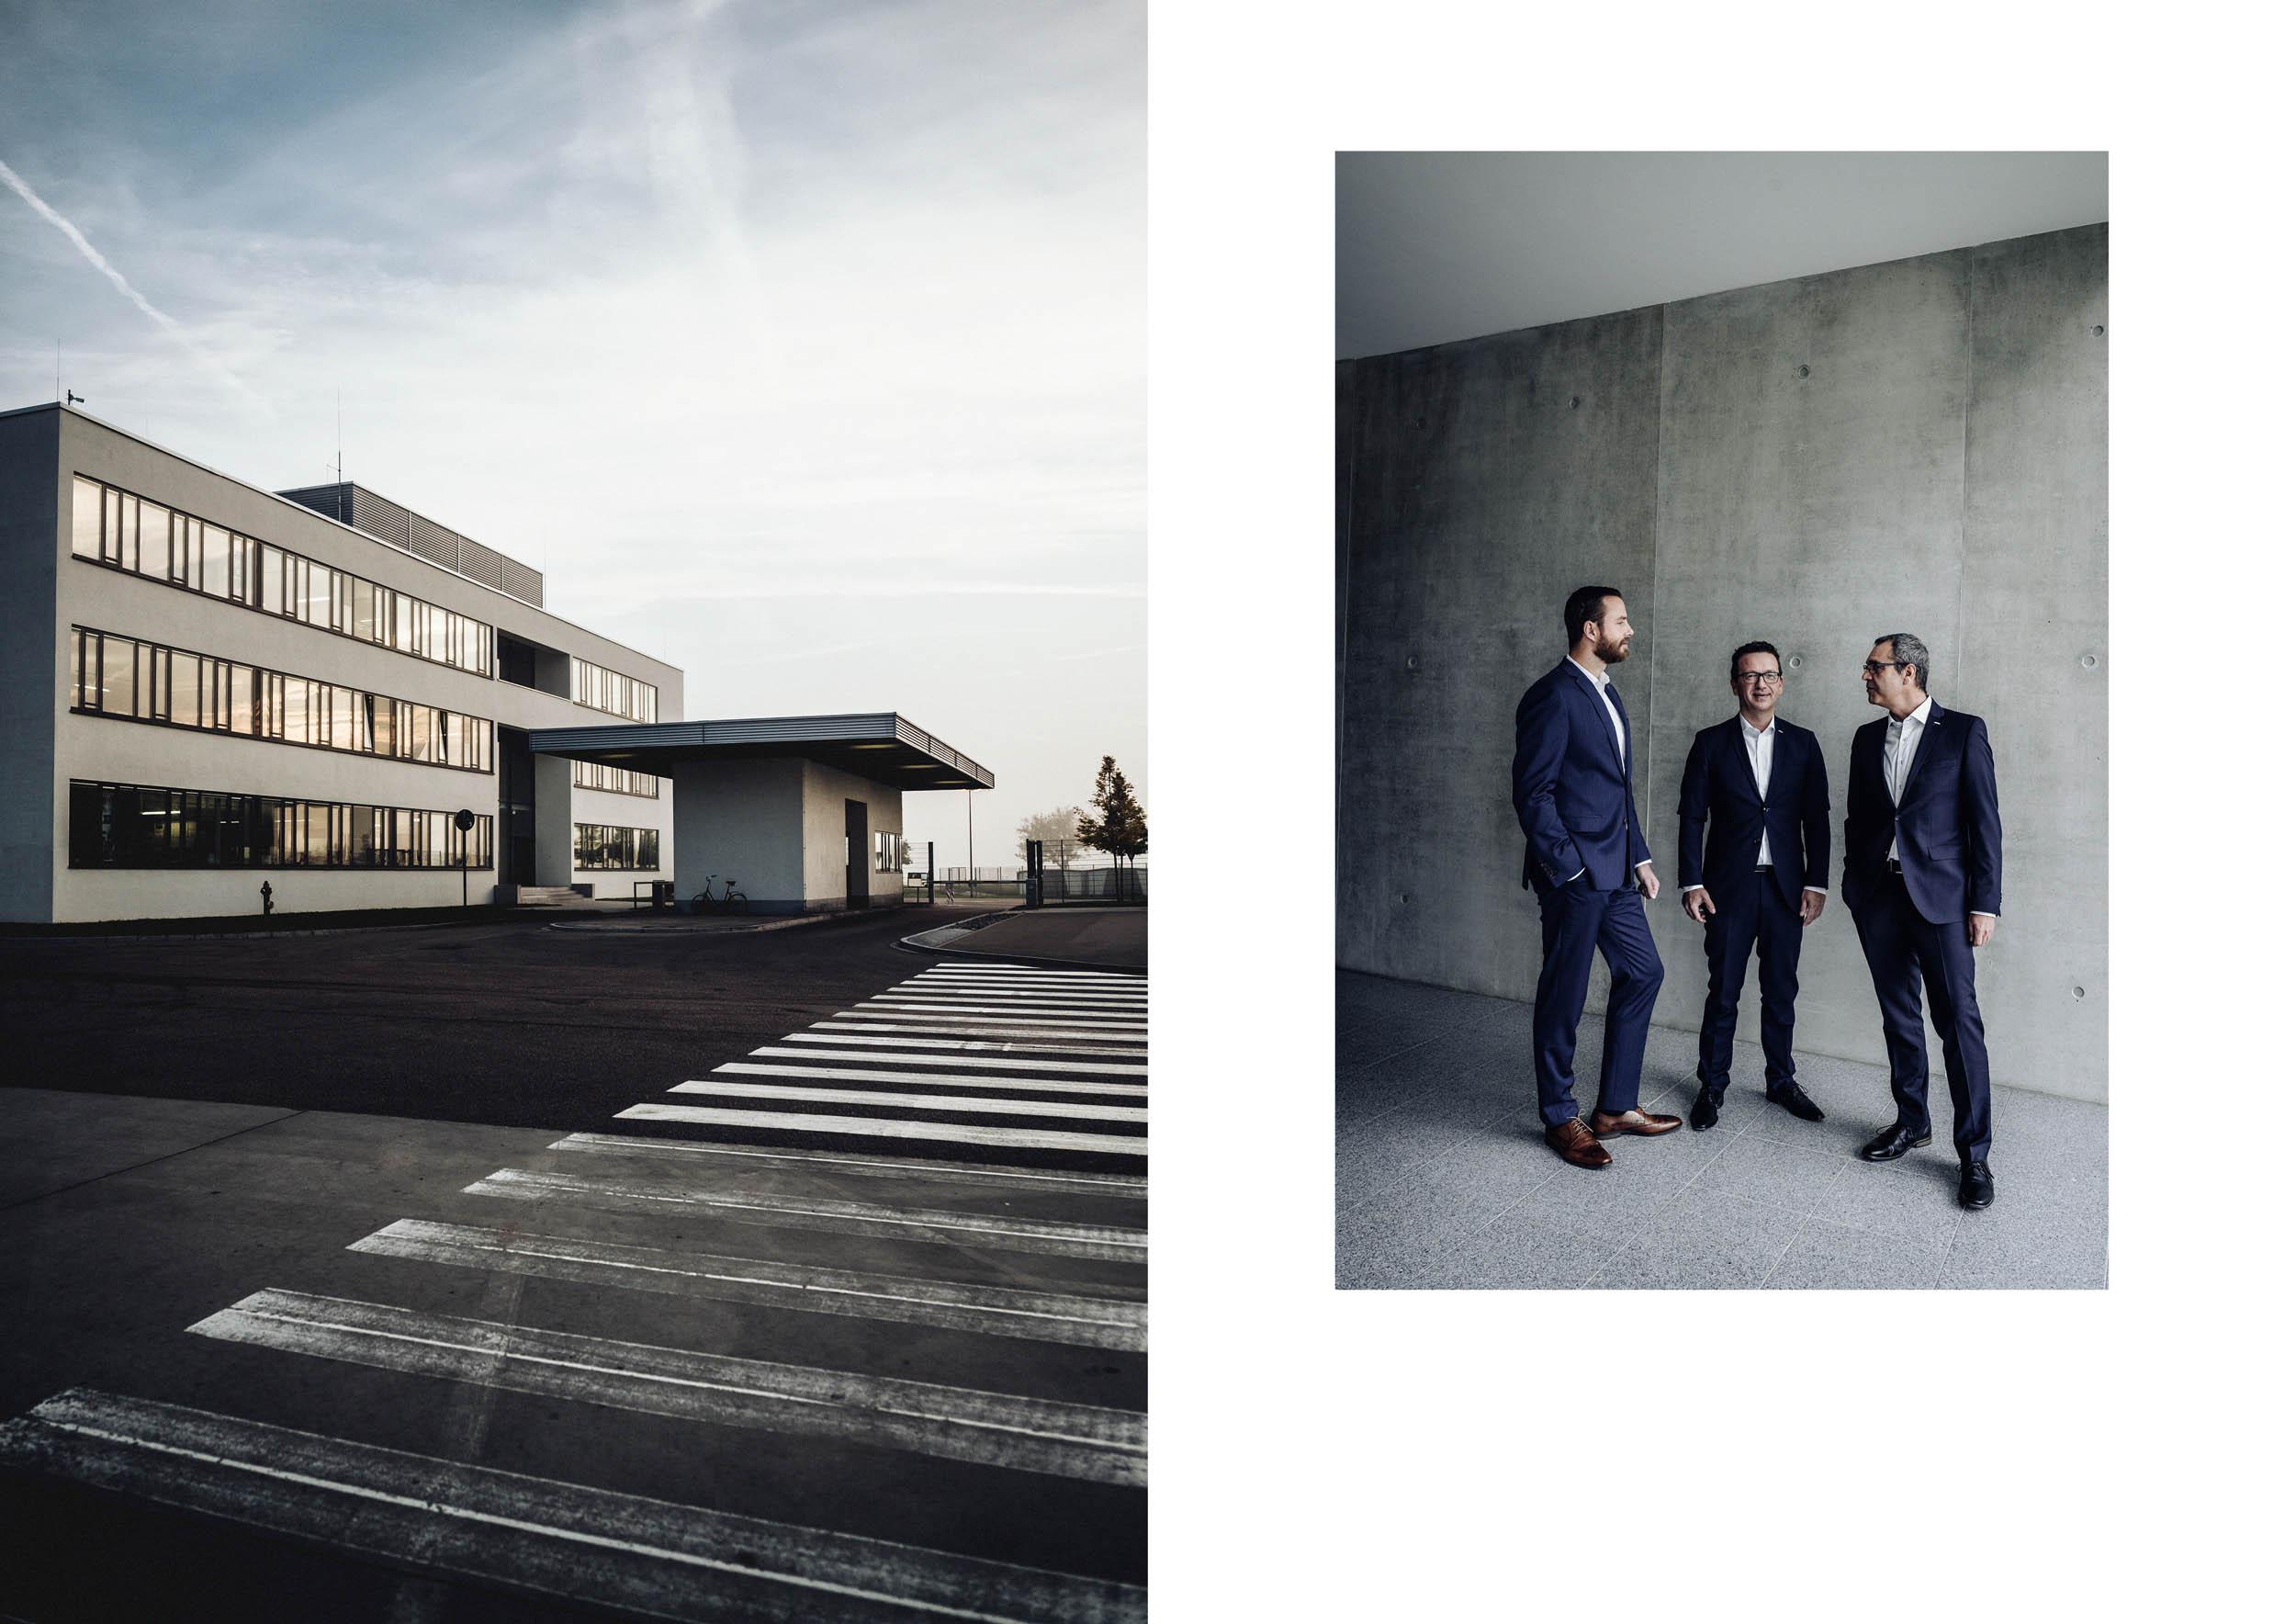 2018_SeifertUebler_schueller_kuechen_corporate_portrait_industrial_photography_006.jpg